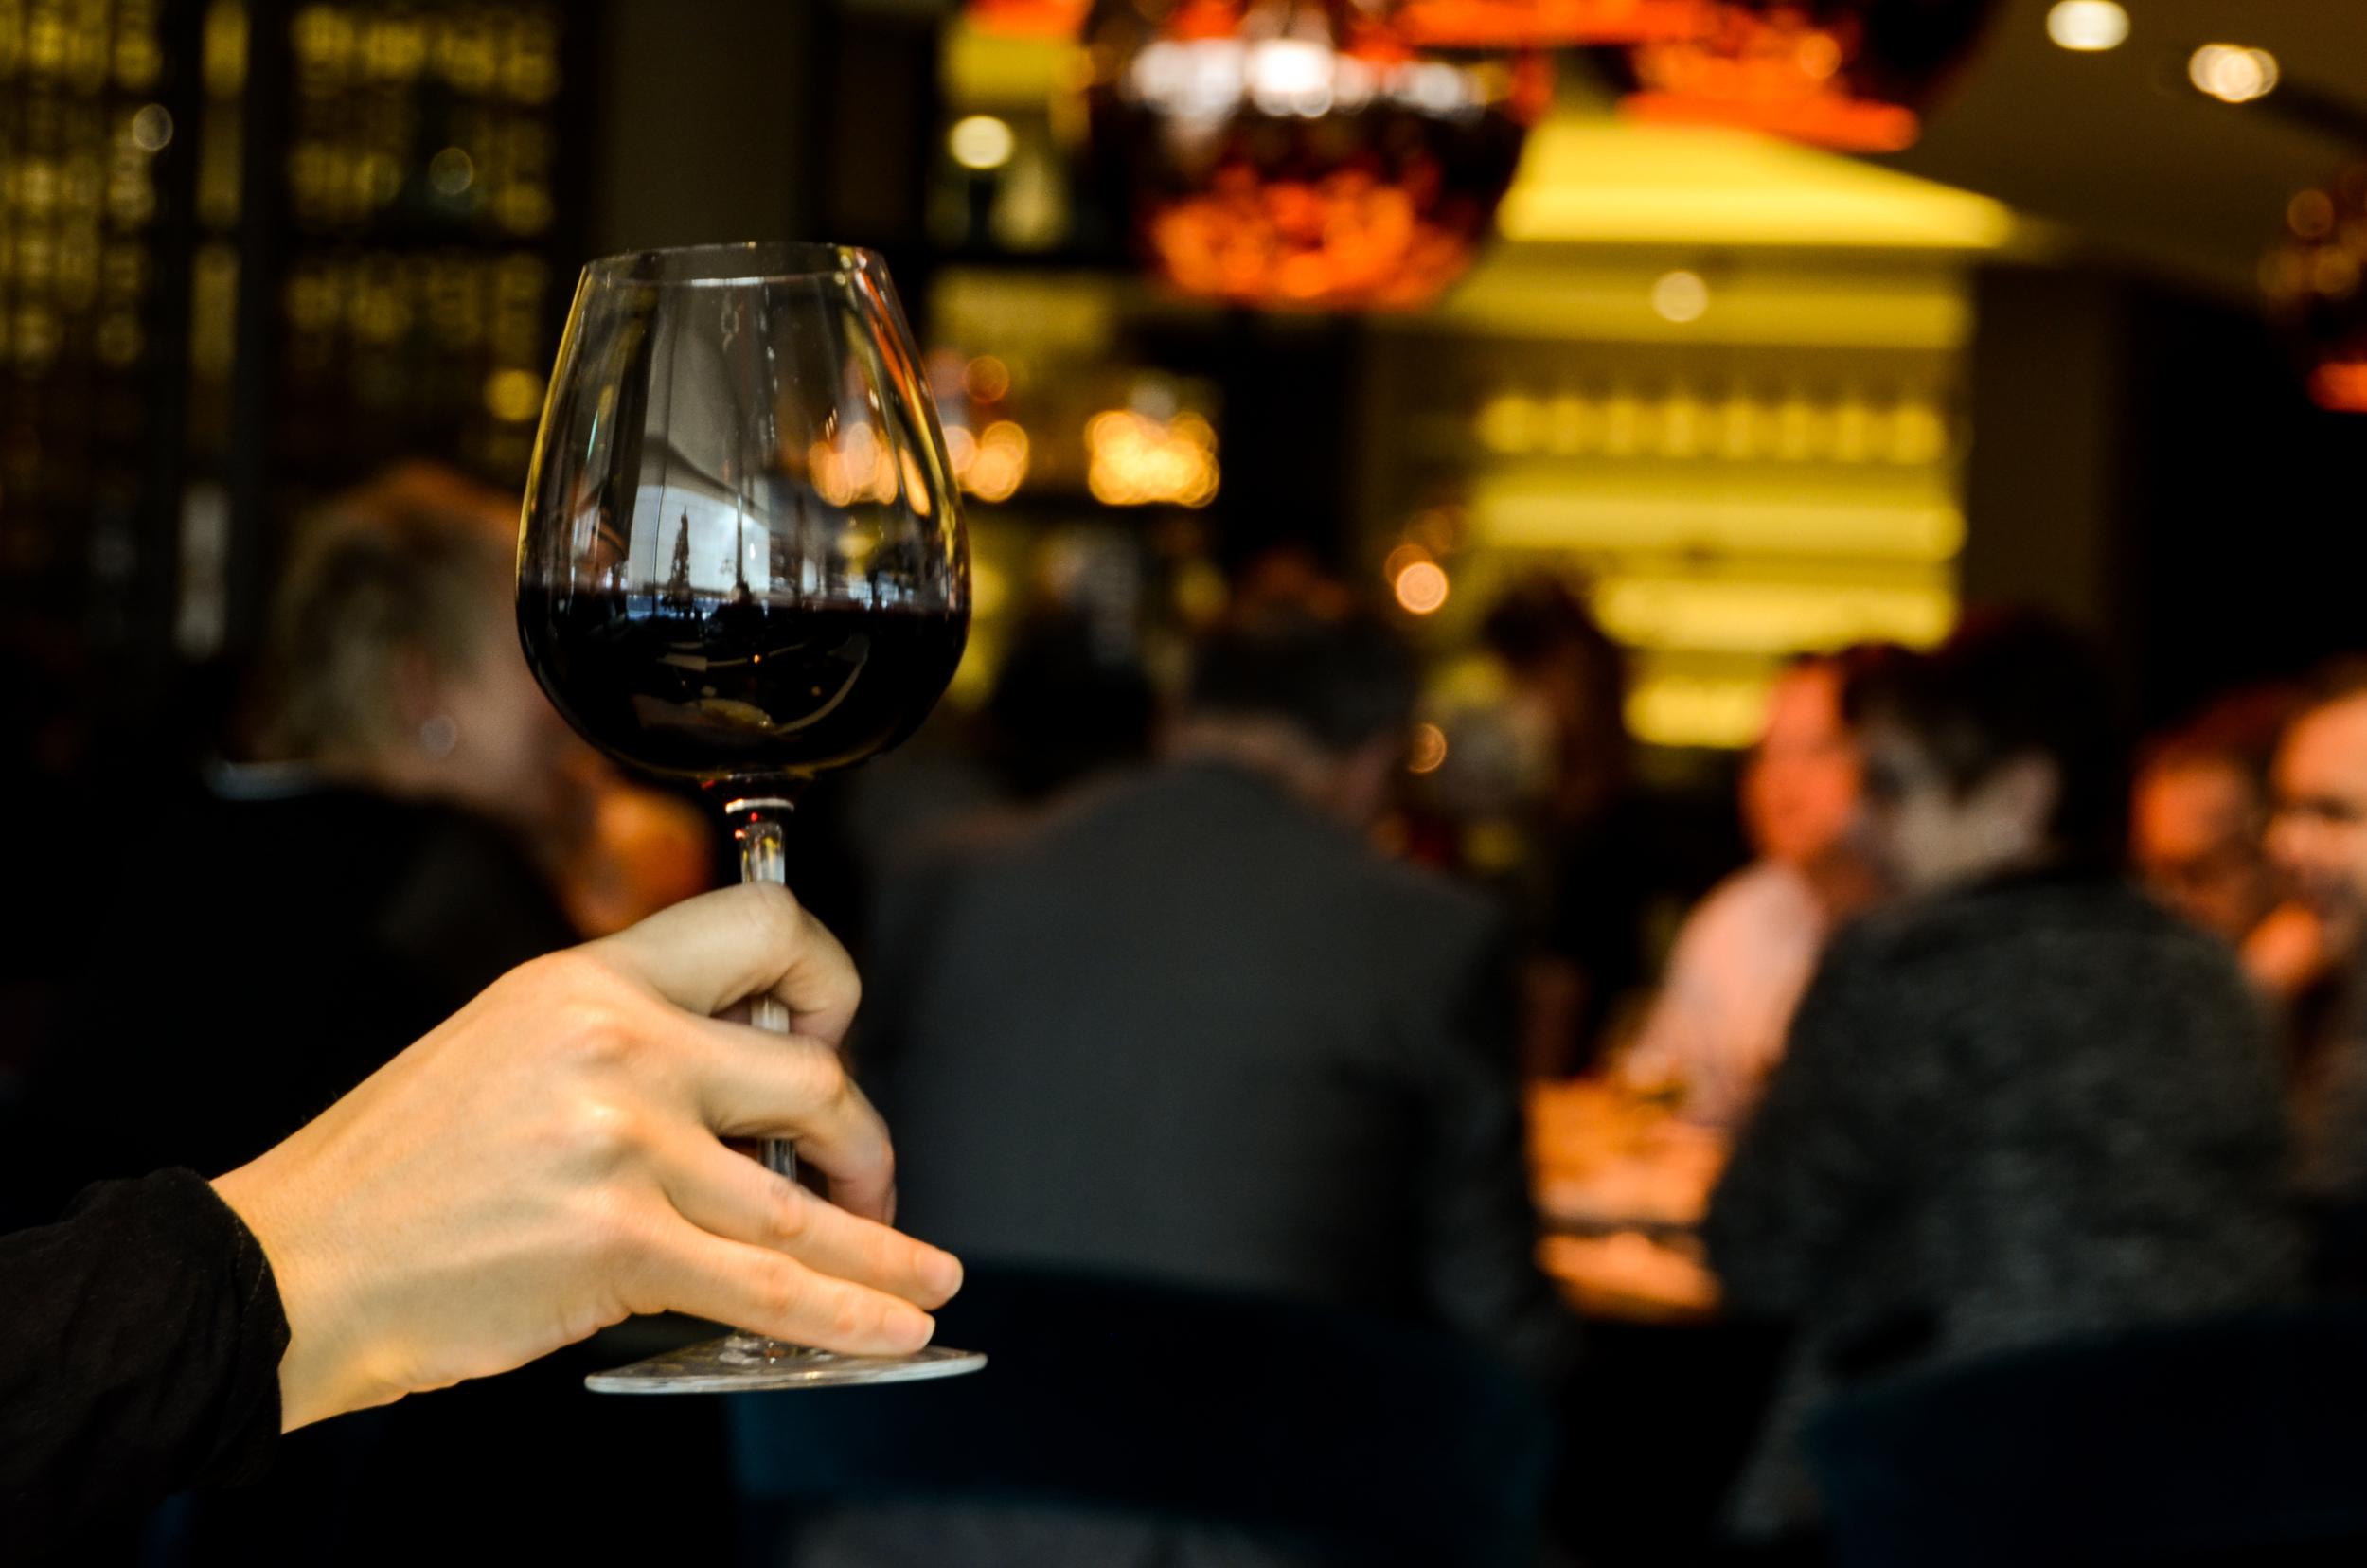 restaurant-person-people-hand.jpg